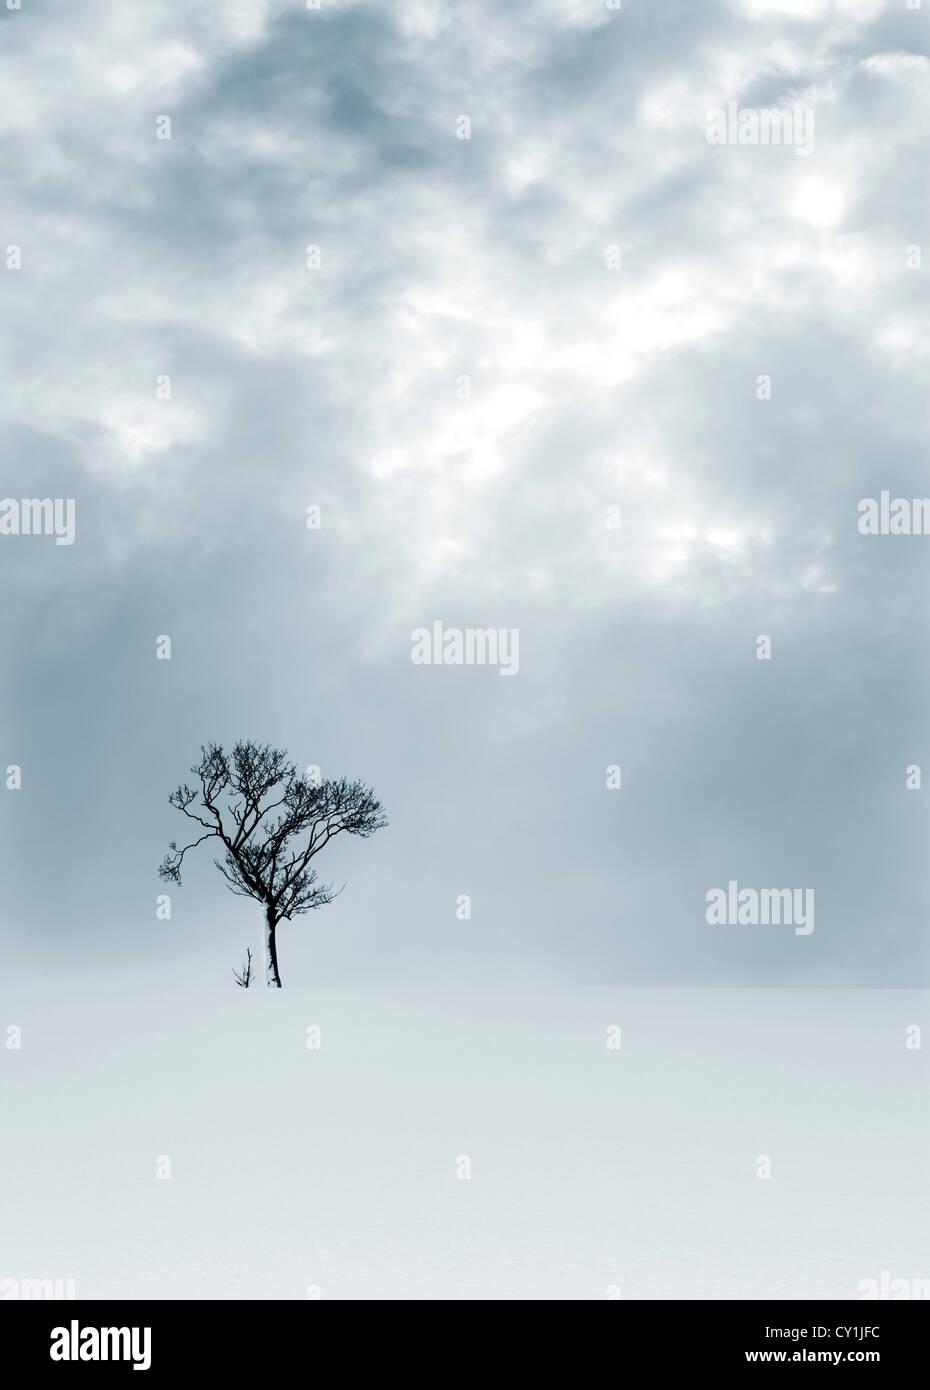 Solitary tree in snowy bleak landscape - Stock Image